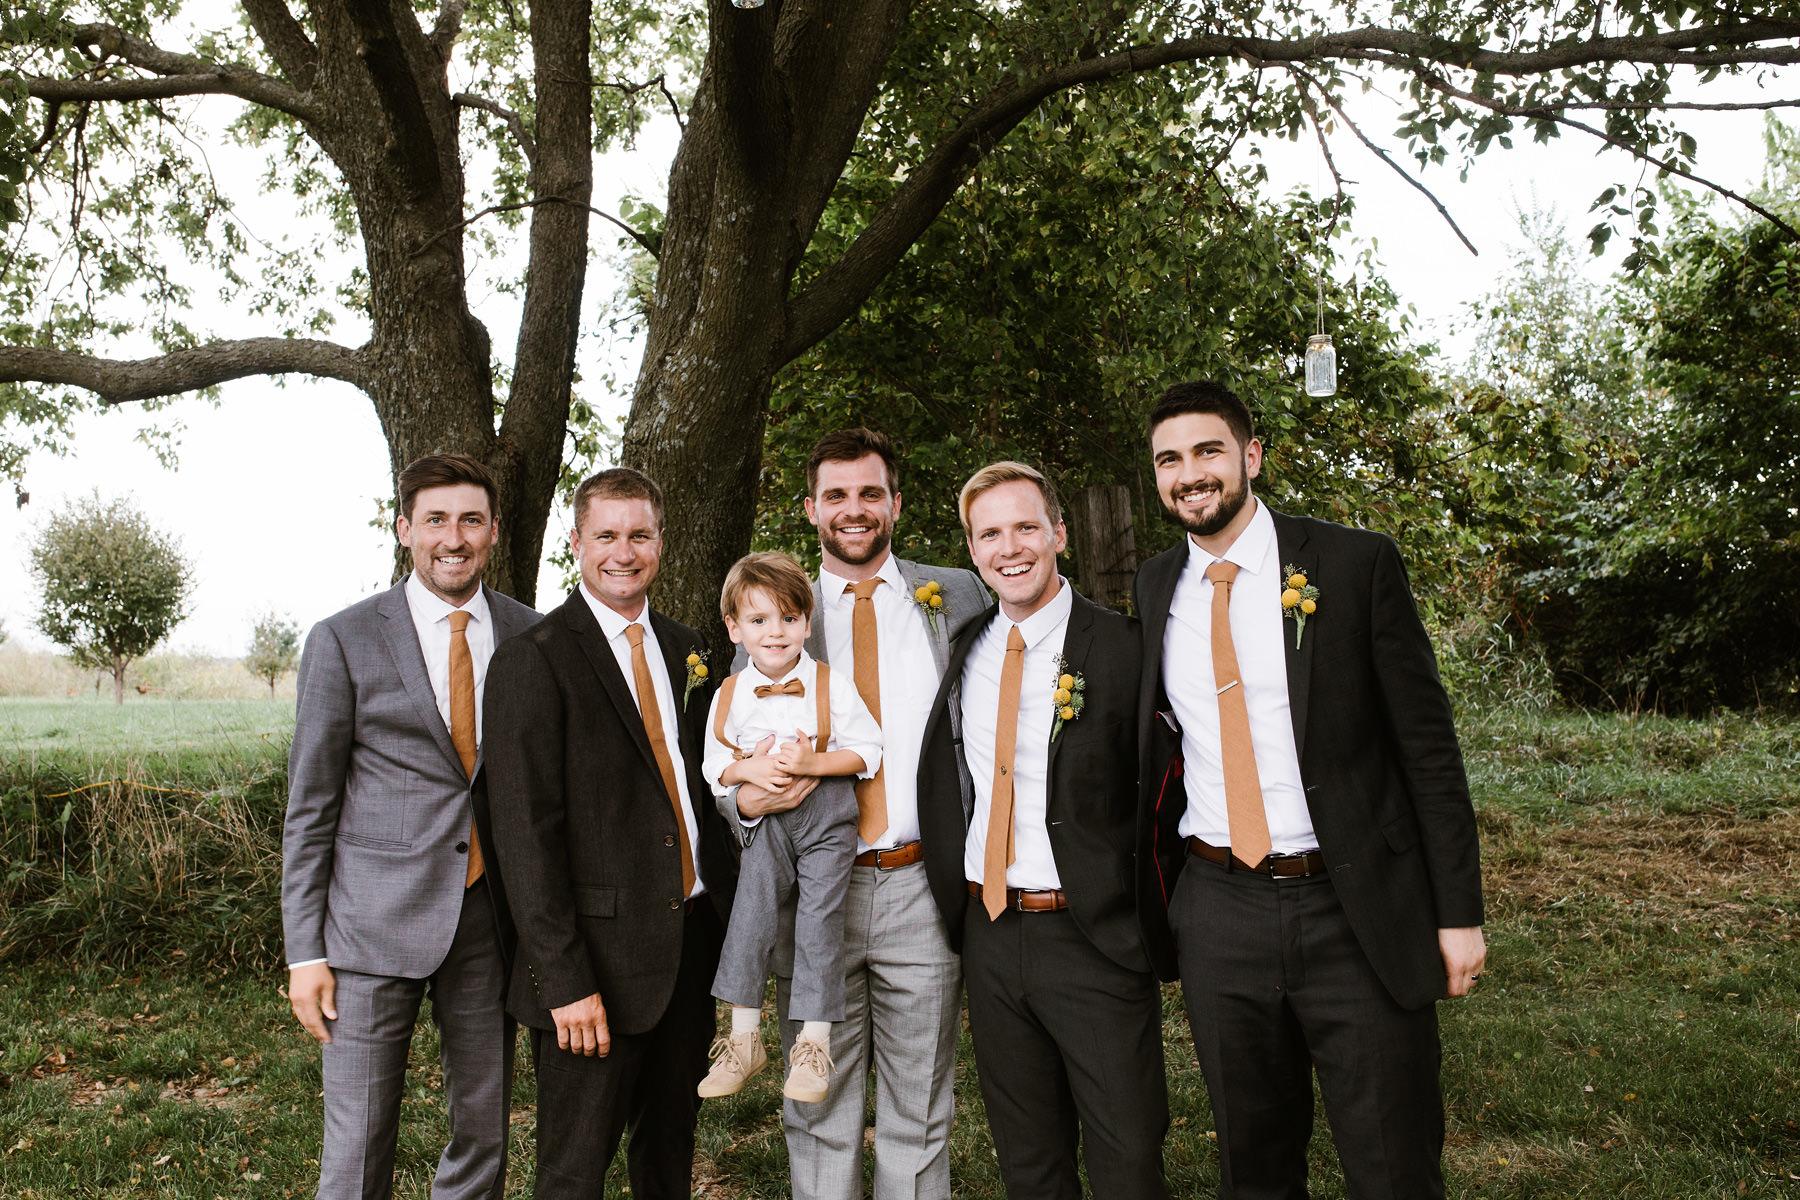 Alldredge Orchard Kansas City_Kindling Wedding Photography BLOG 53.JPG